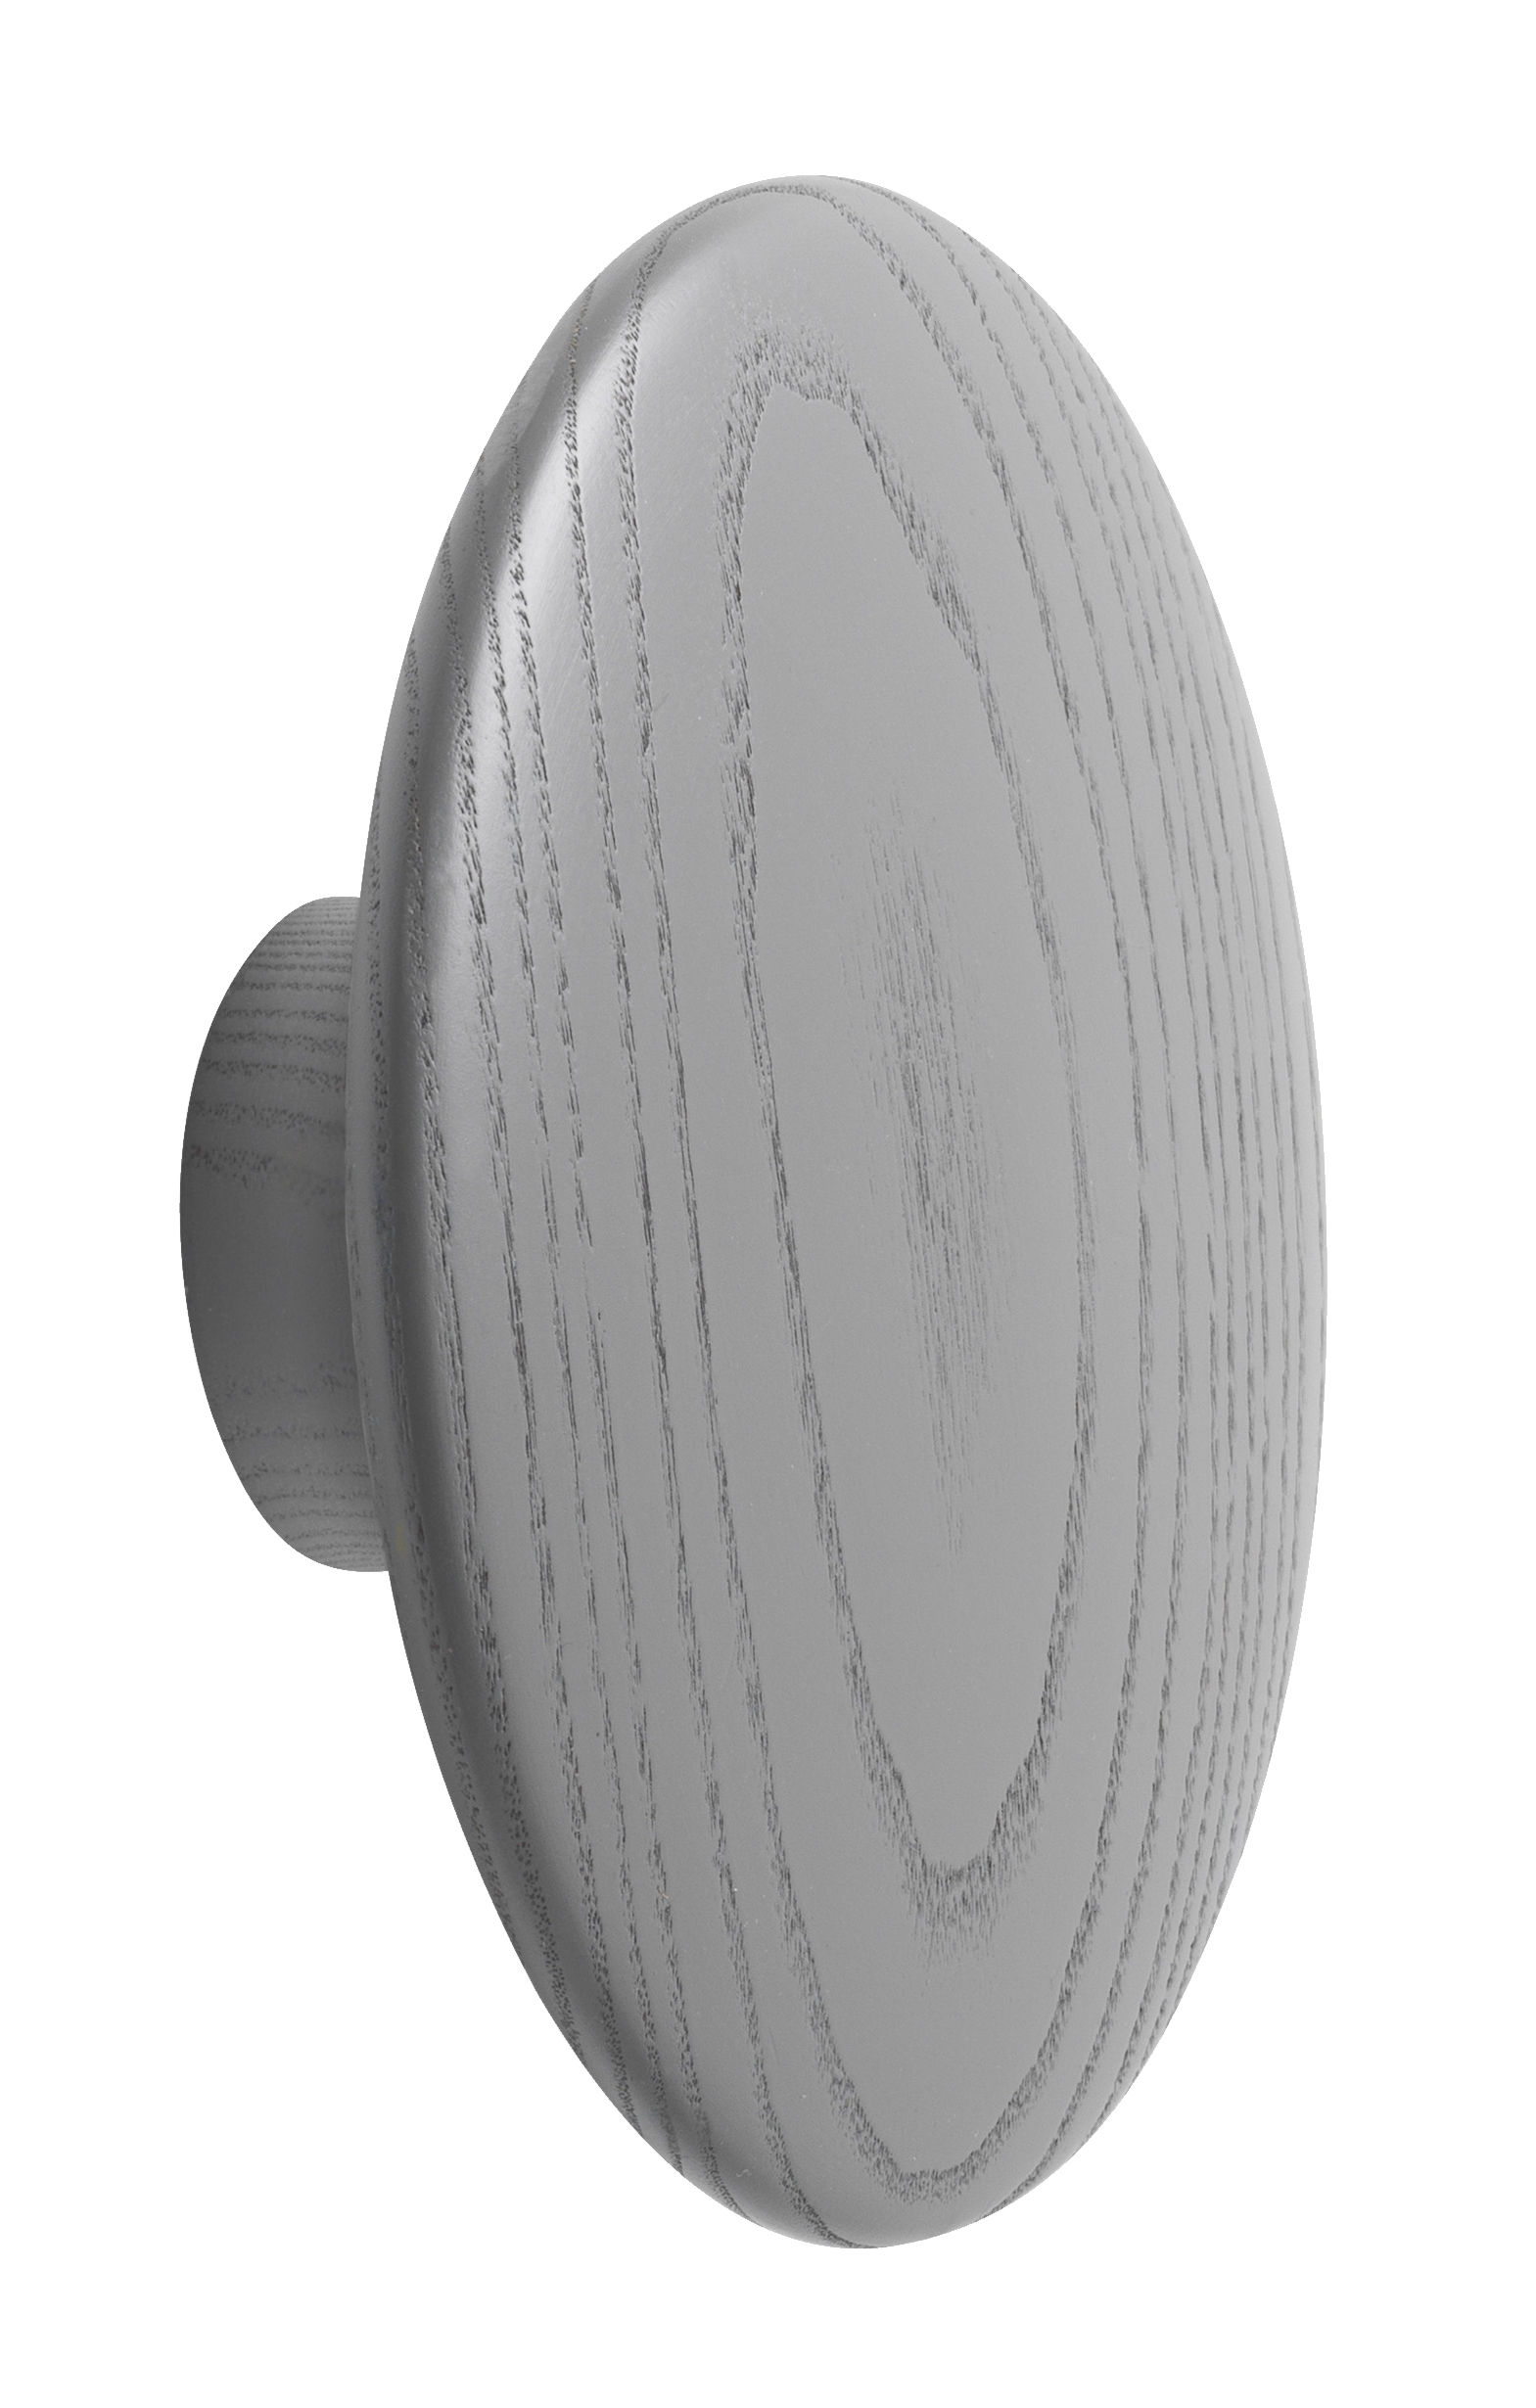 Furniture - Coat Racks & Pegs - The dots Hook - Large - Ø 17 cm by Muuto - Dark grey - Tinted ashwood